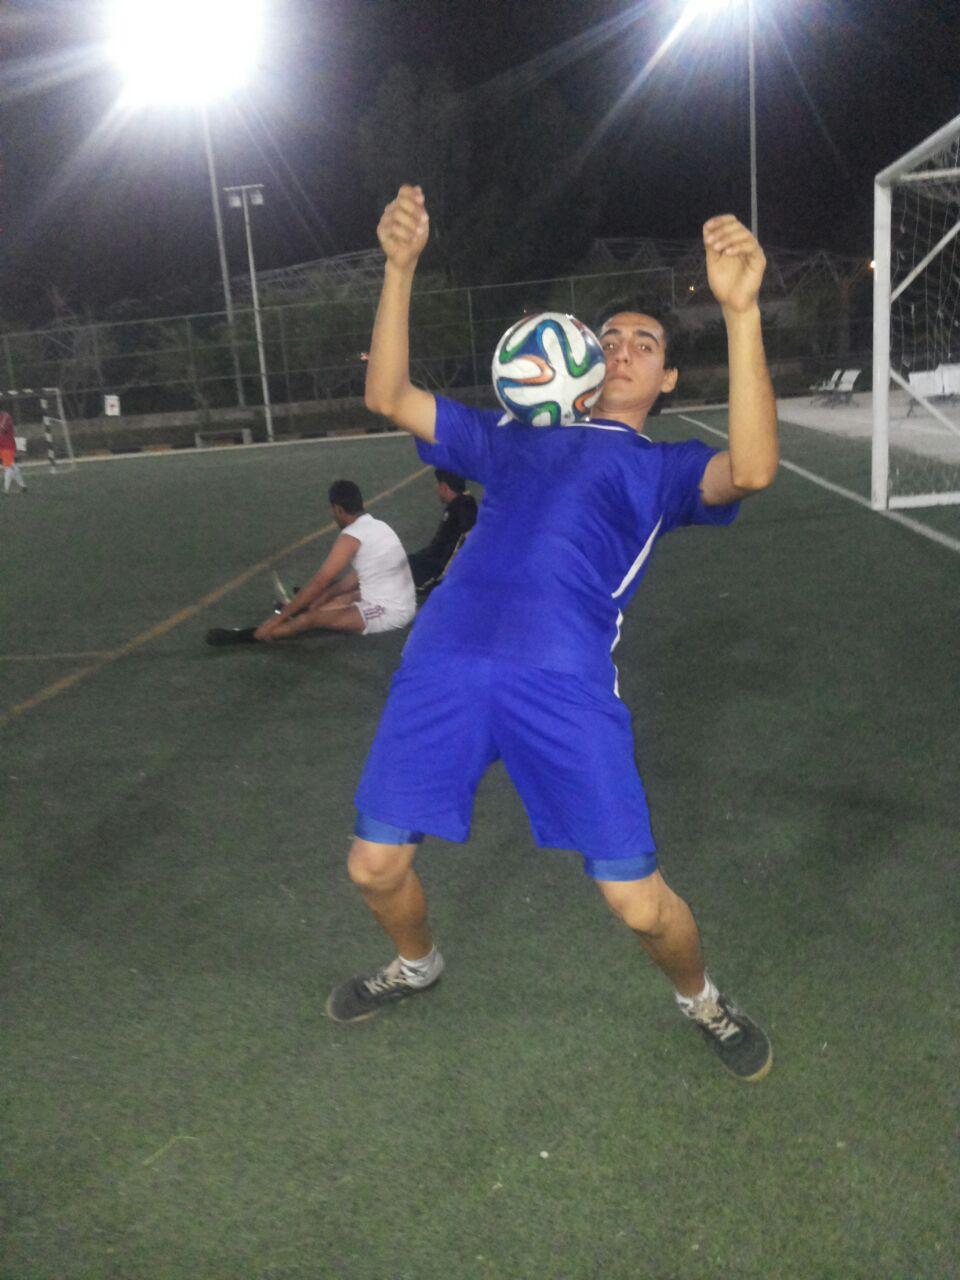 http://ronaldosaeed7.loxblog.com/upload/r/ronaldosaeed7/image/postsimage/ronaldosaeed7-23.jpg